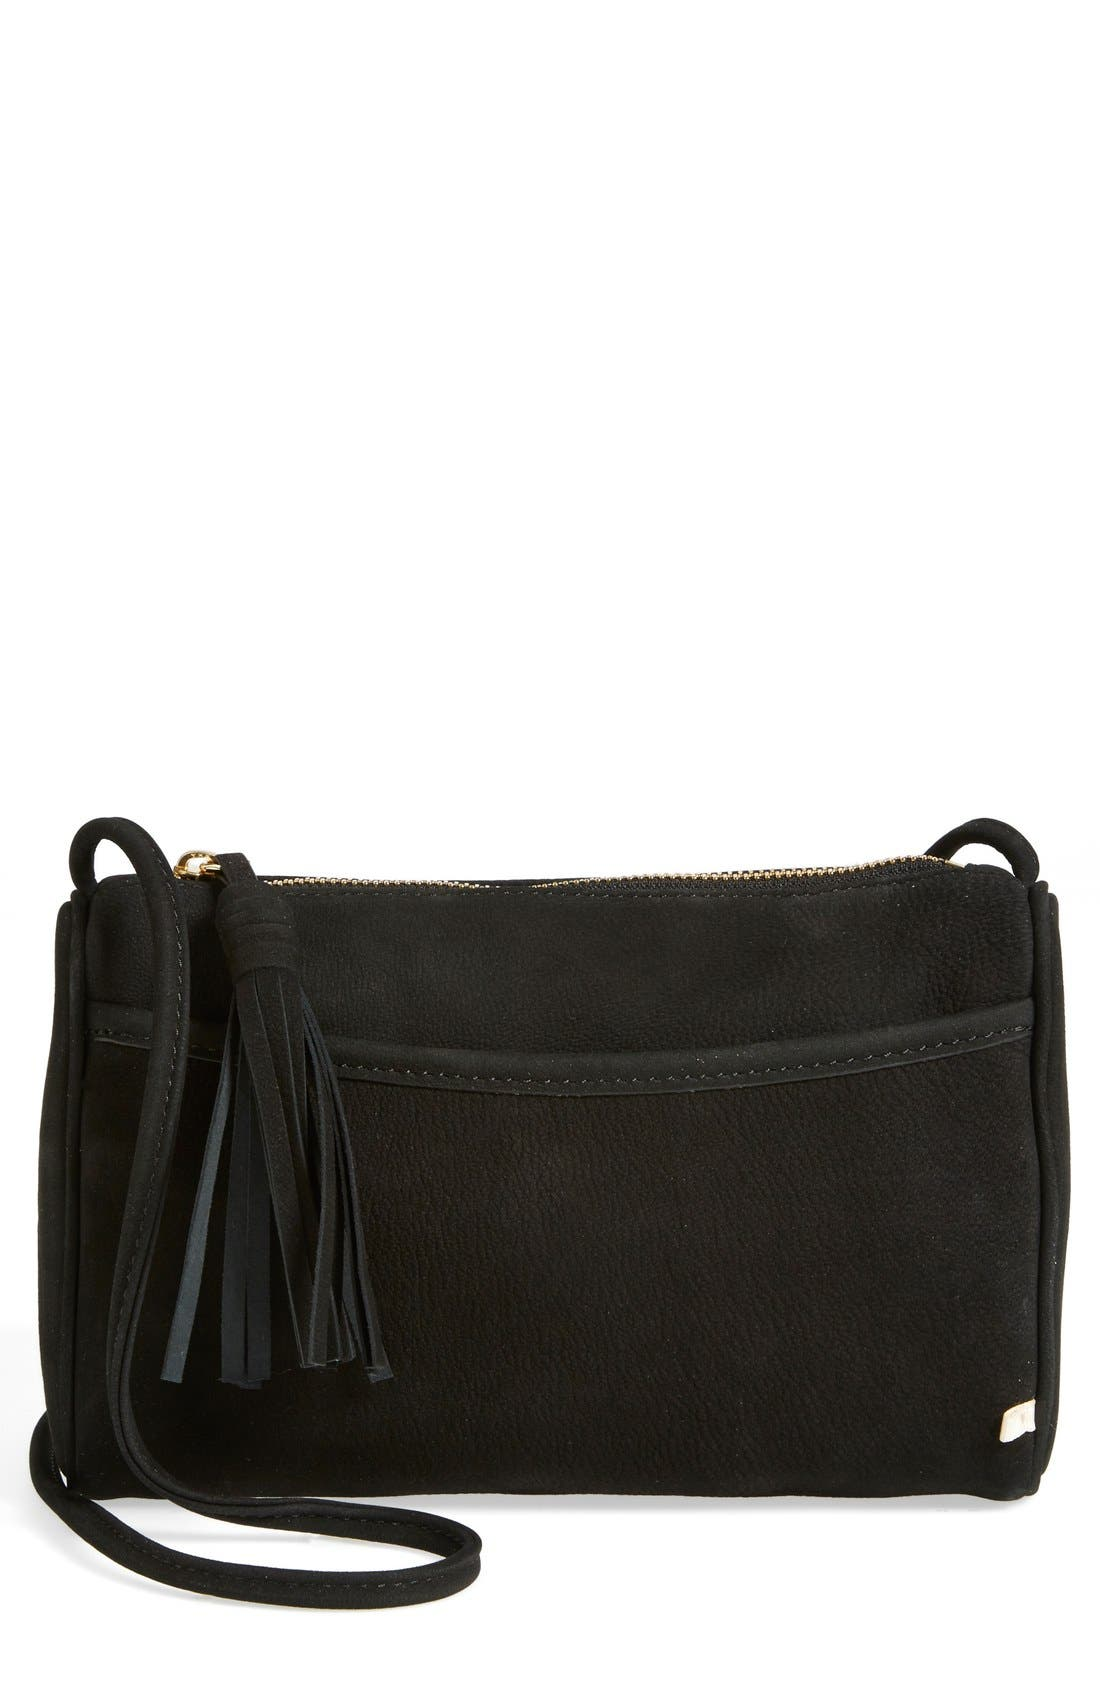 Main Image - SJP by Sarah Jessica Parker 'Crosstown' Nubuck Crossbody Bag